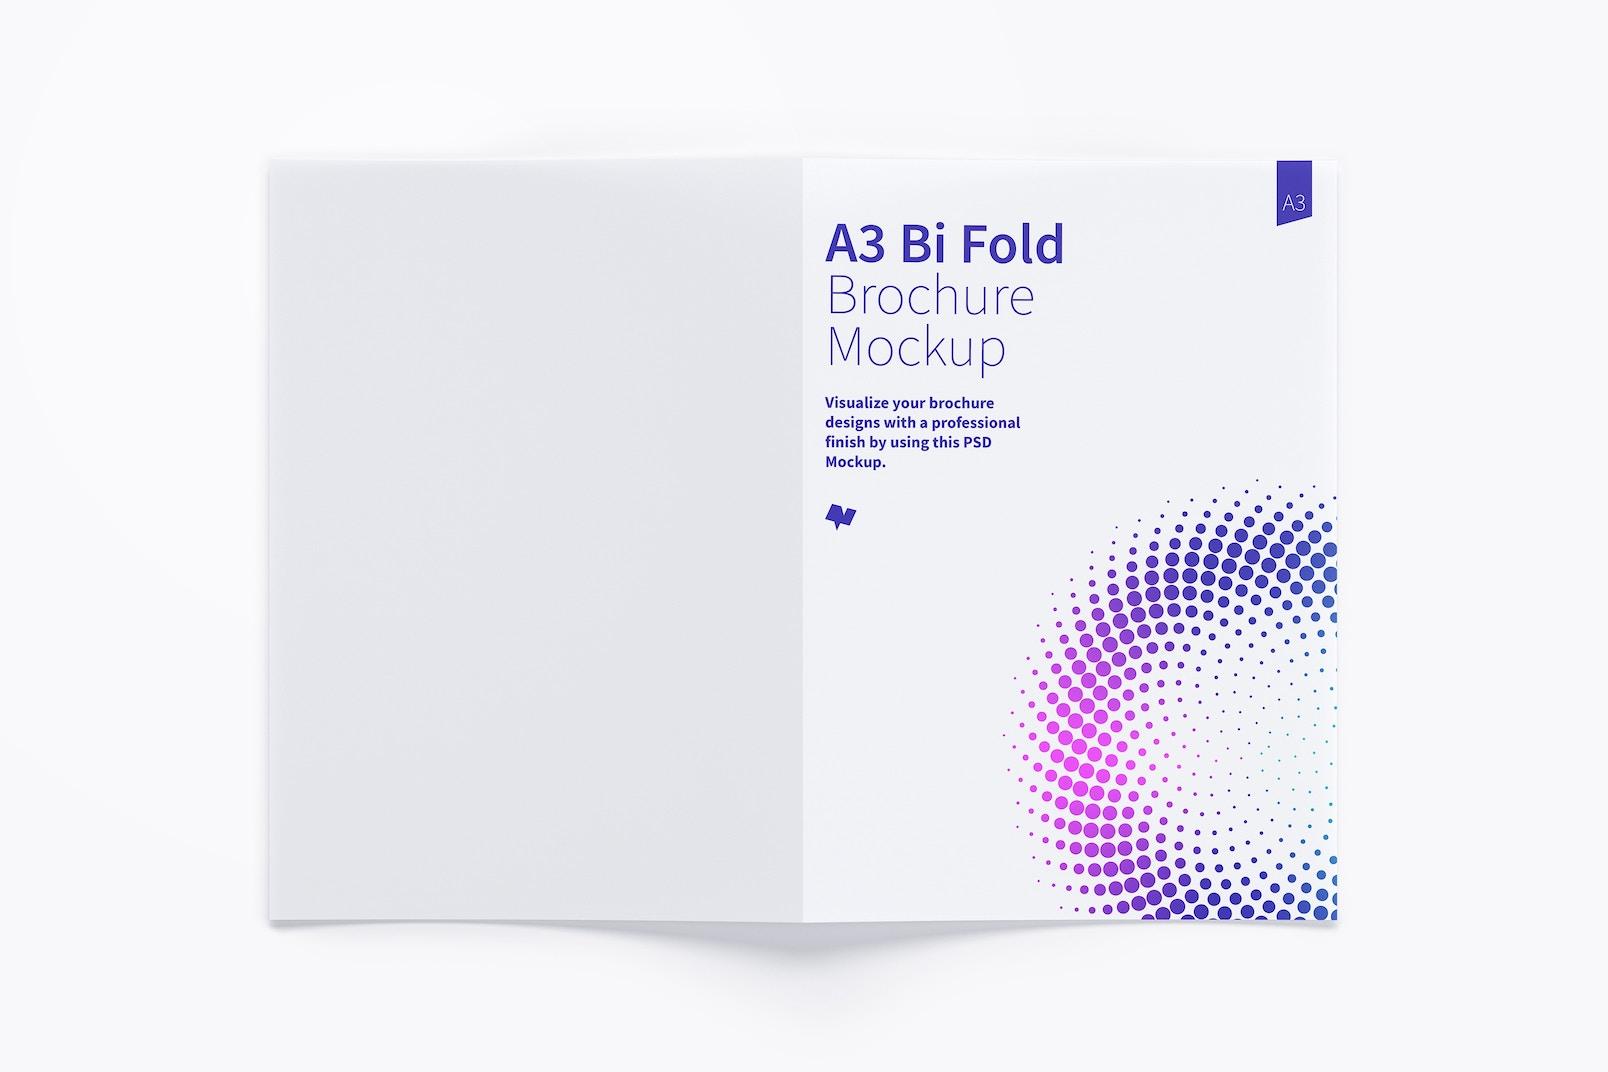 A3 Bi Fold Brochure Mockup 02